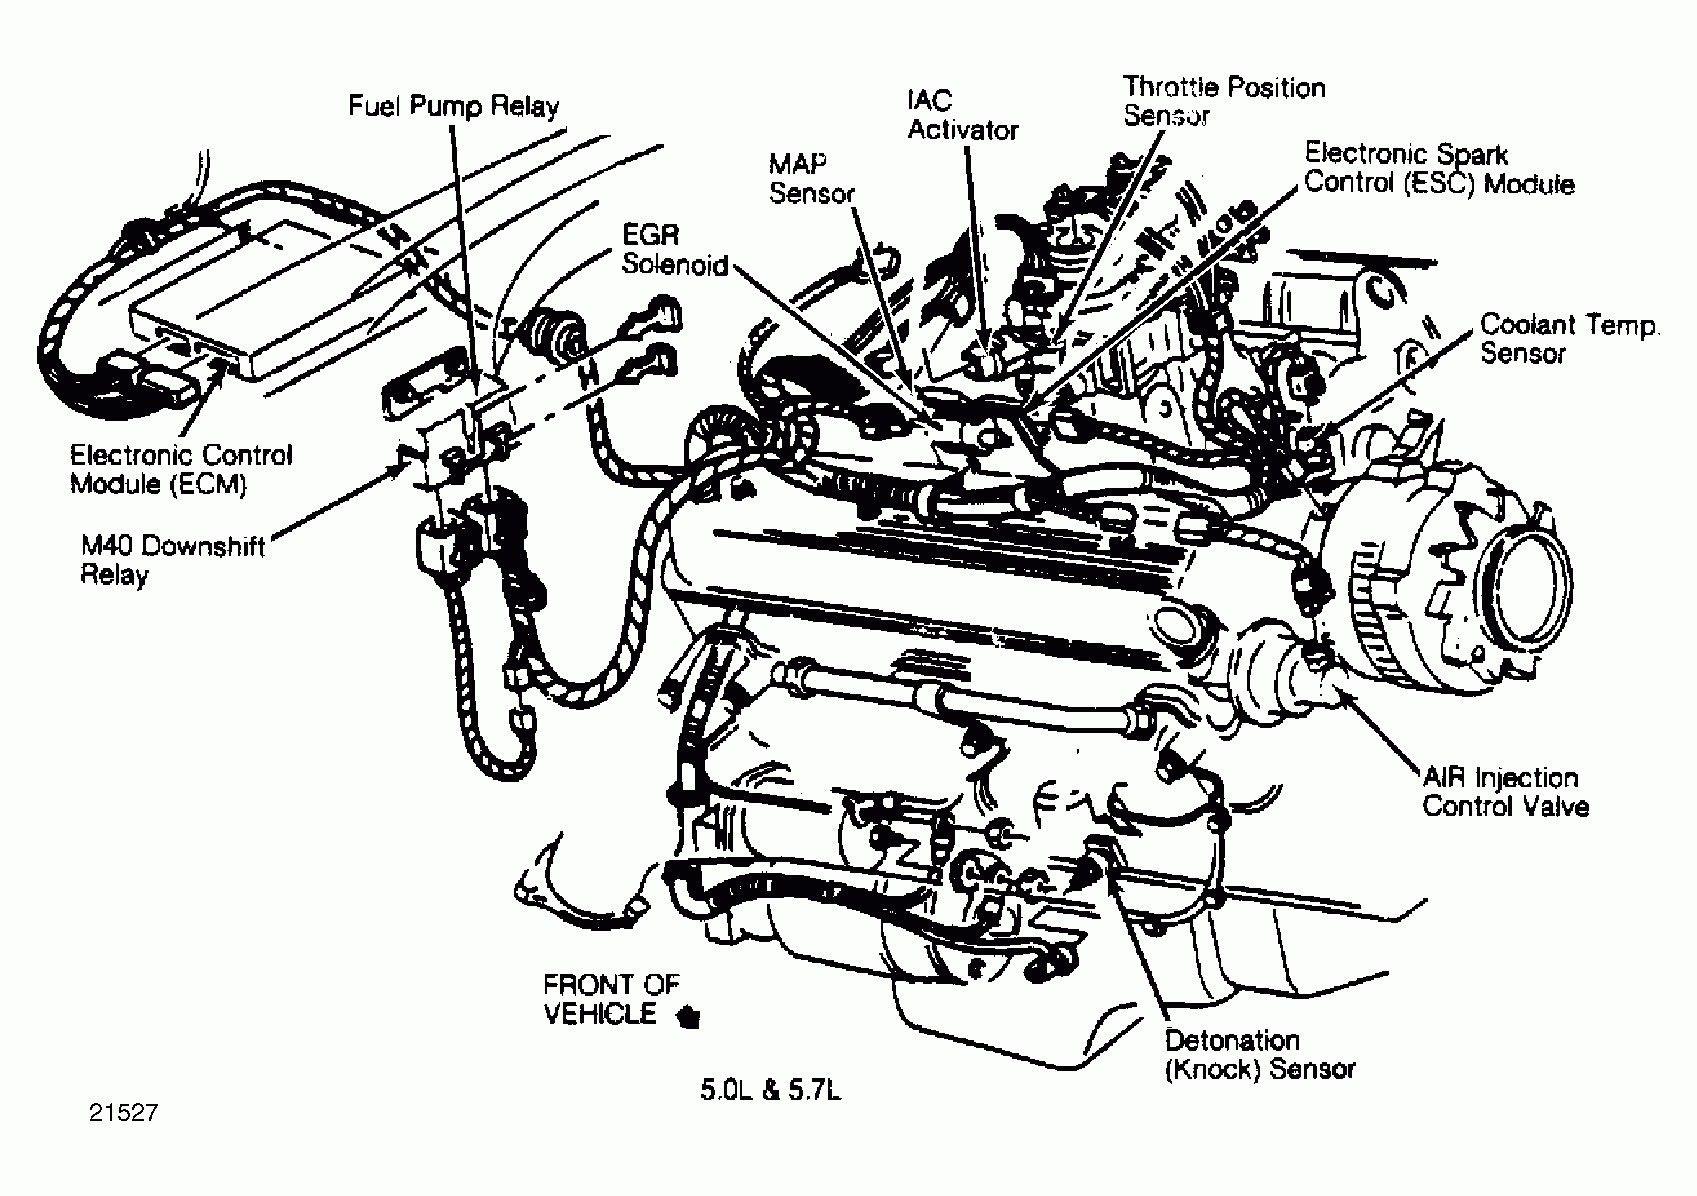 98 Chevy Blazer Engine Diagram In 2021 Chevy Trailblazer Chevy Chevy S10